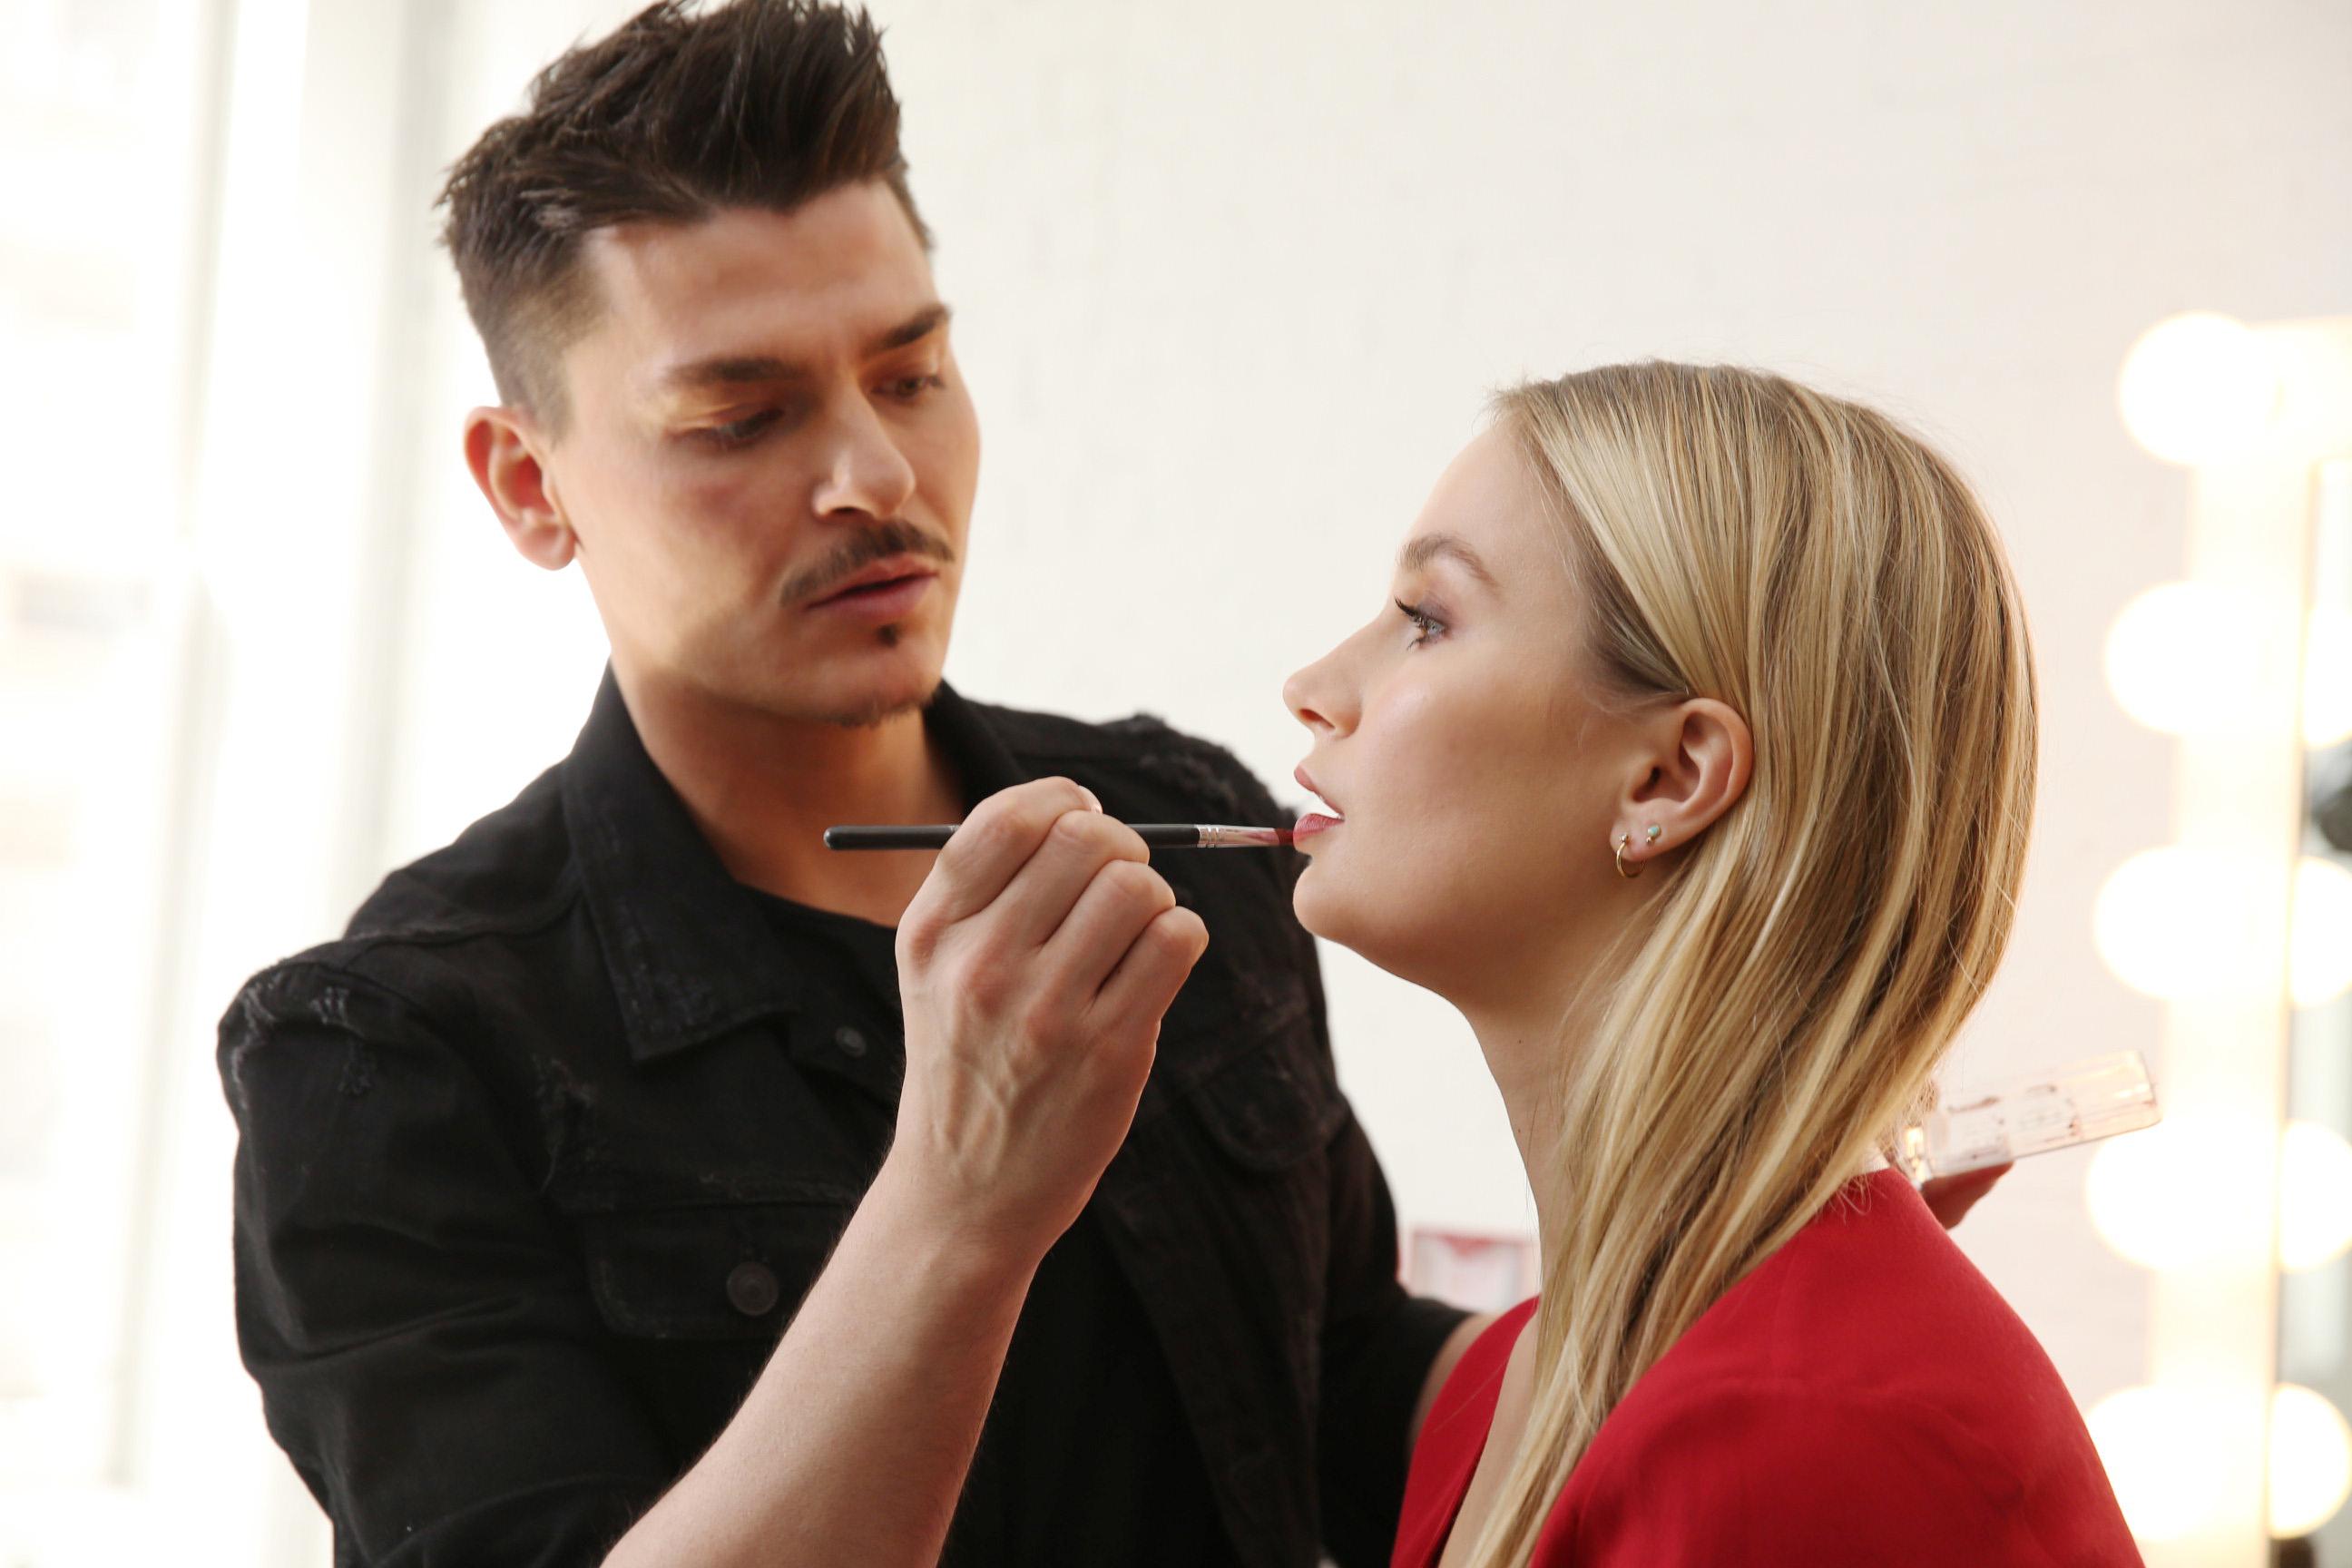 Makeup artist mario dedivanovic